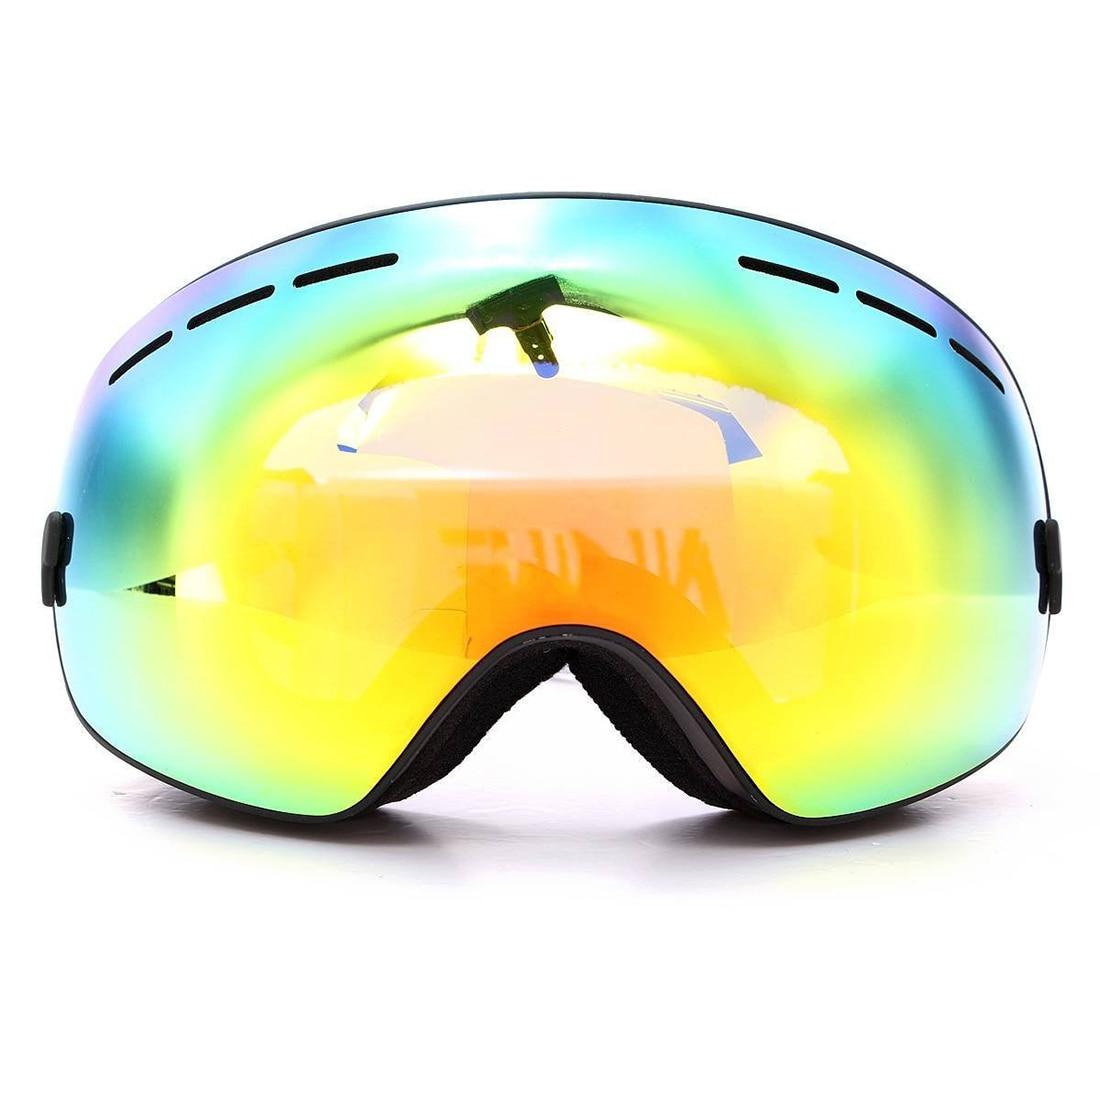 BENICE ski goggles double layer anti-fog eyes